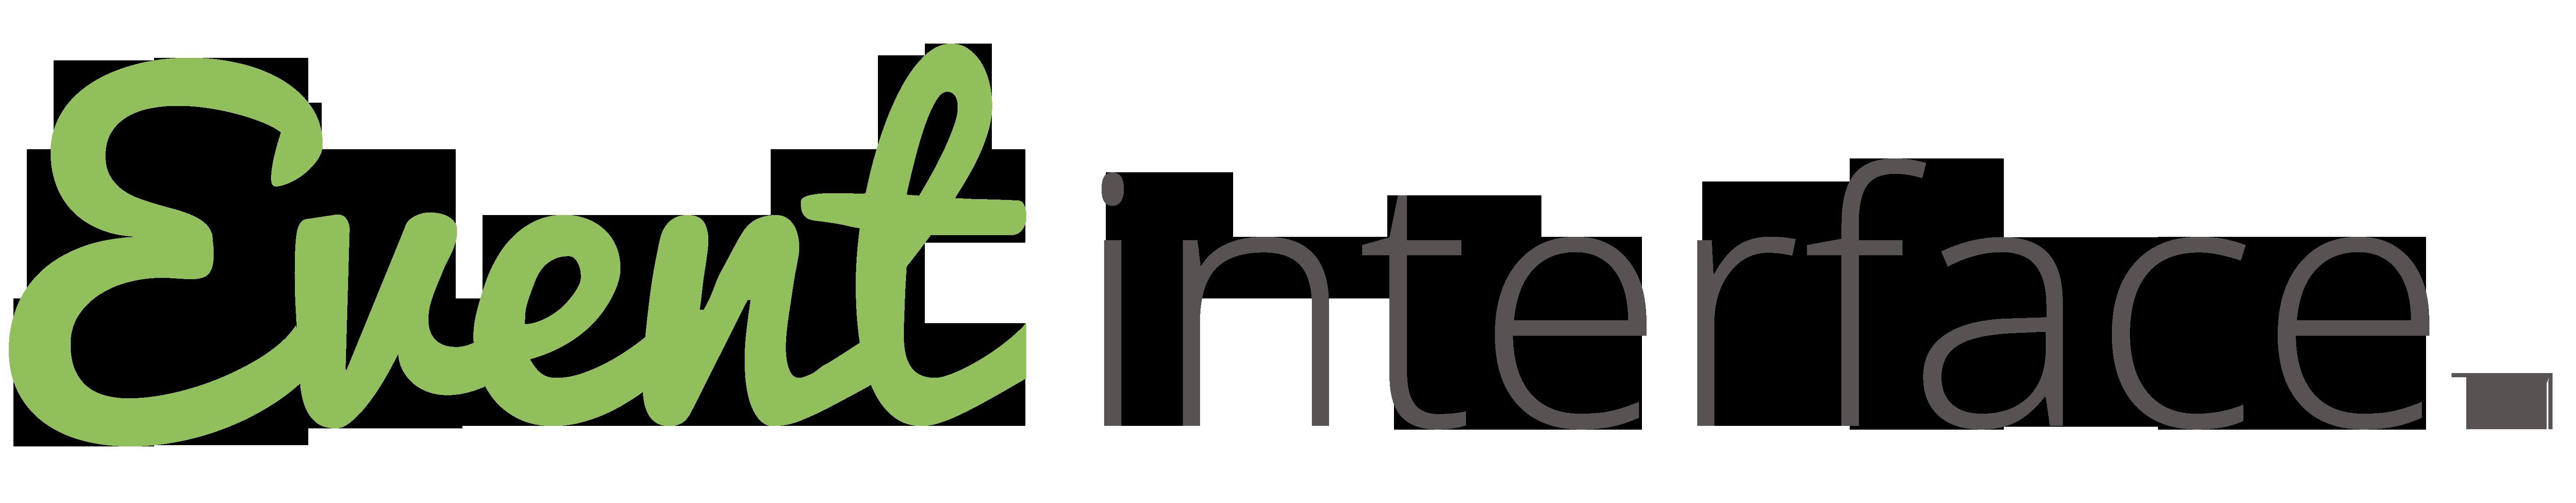 Eventinterface Meeting Planning Workshop - Online Registration